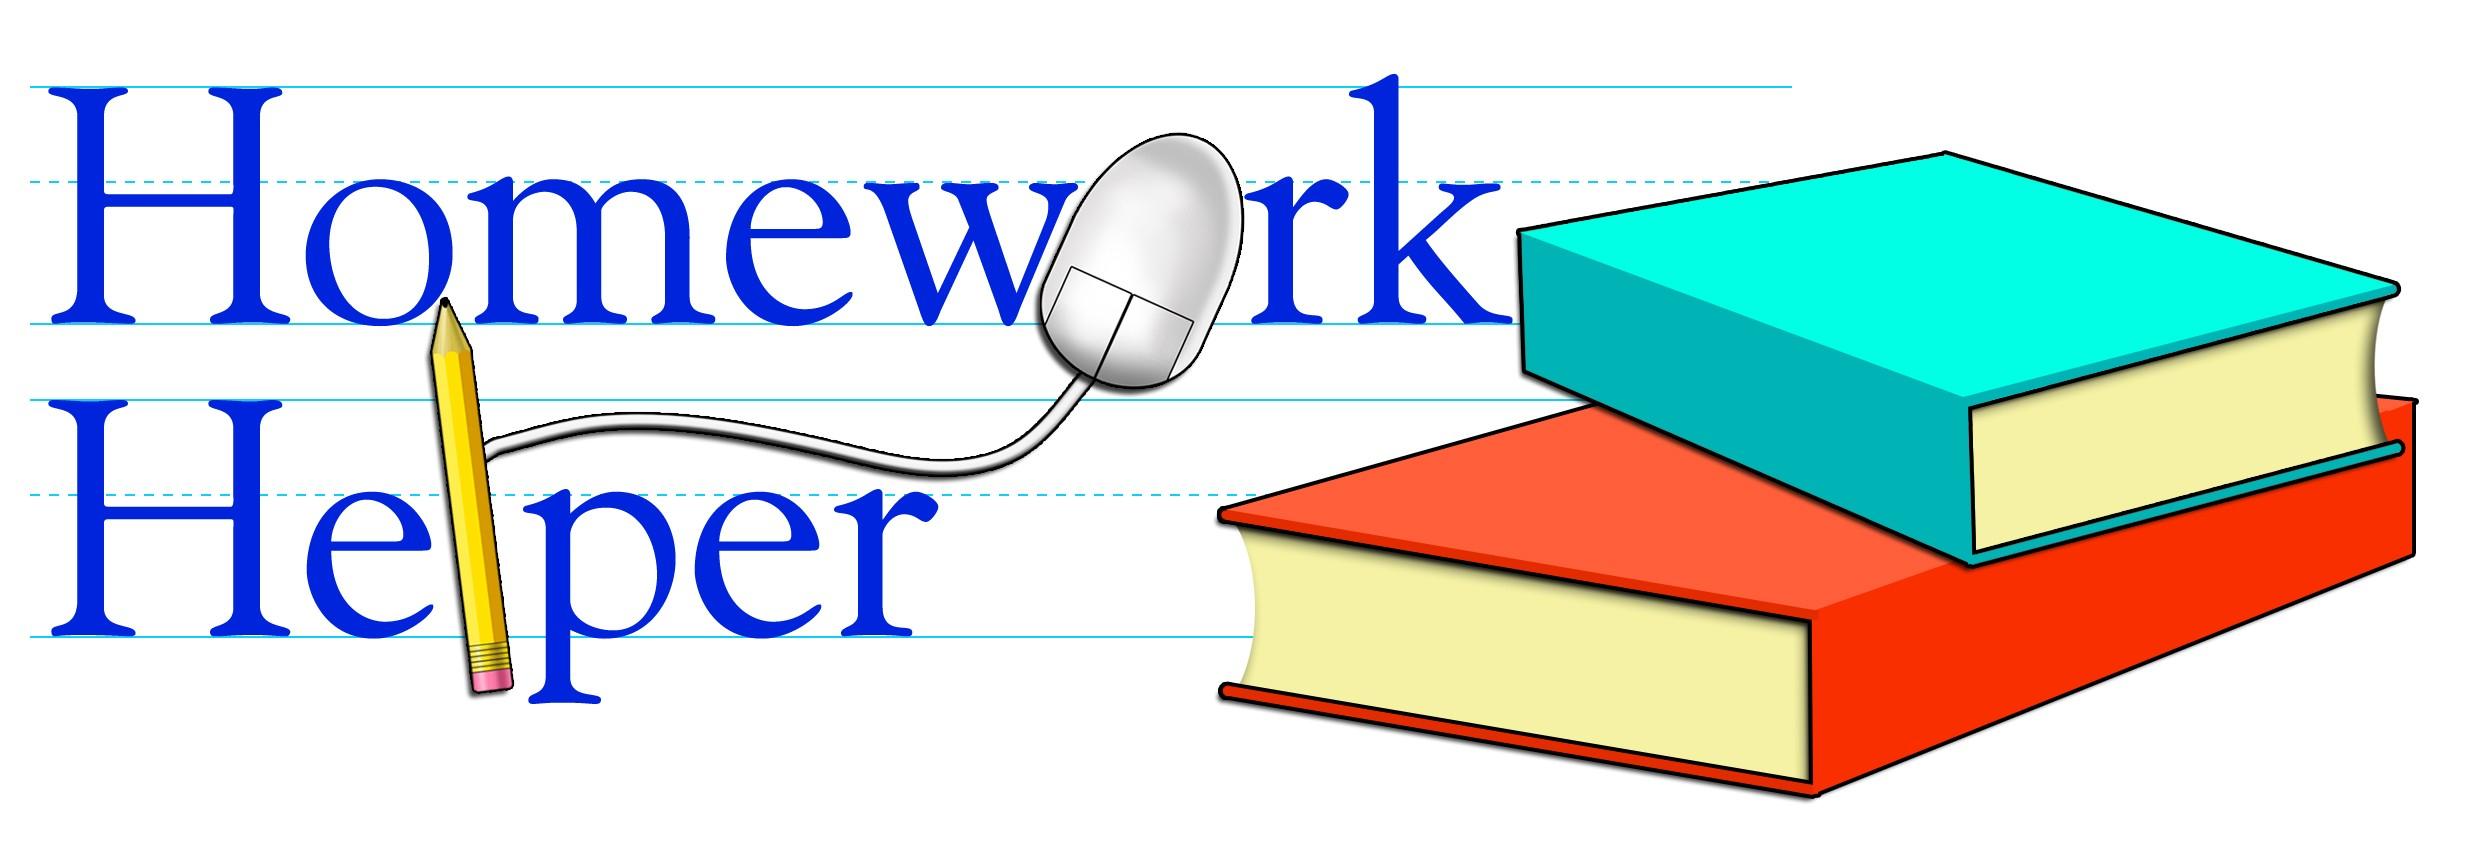 2484x858 Homework Tips